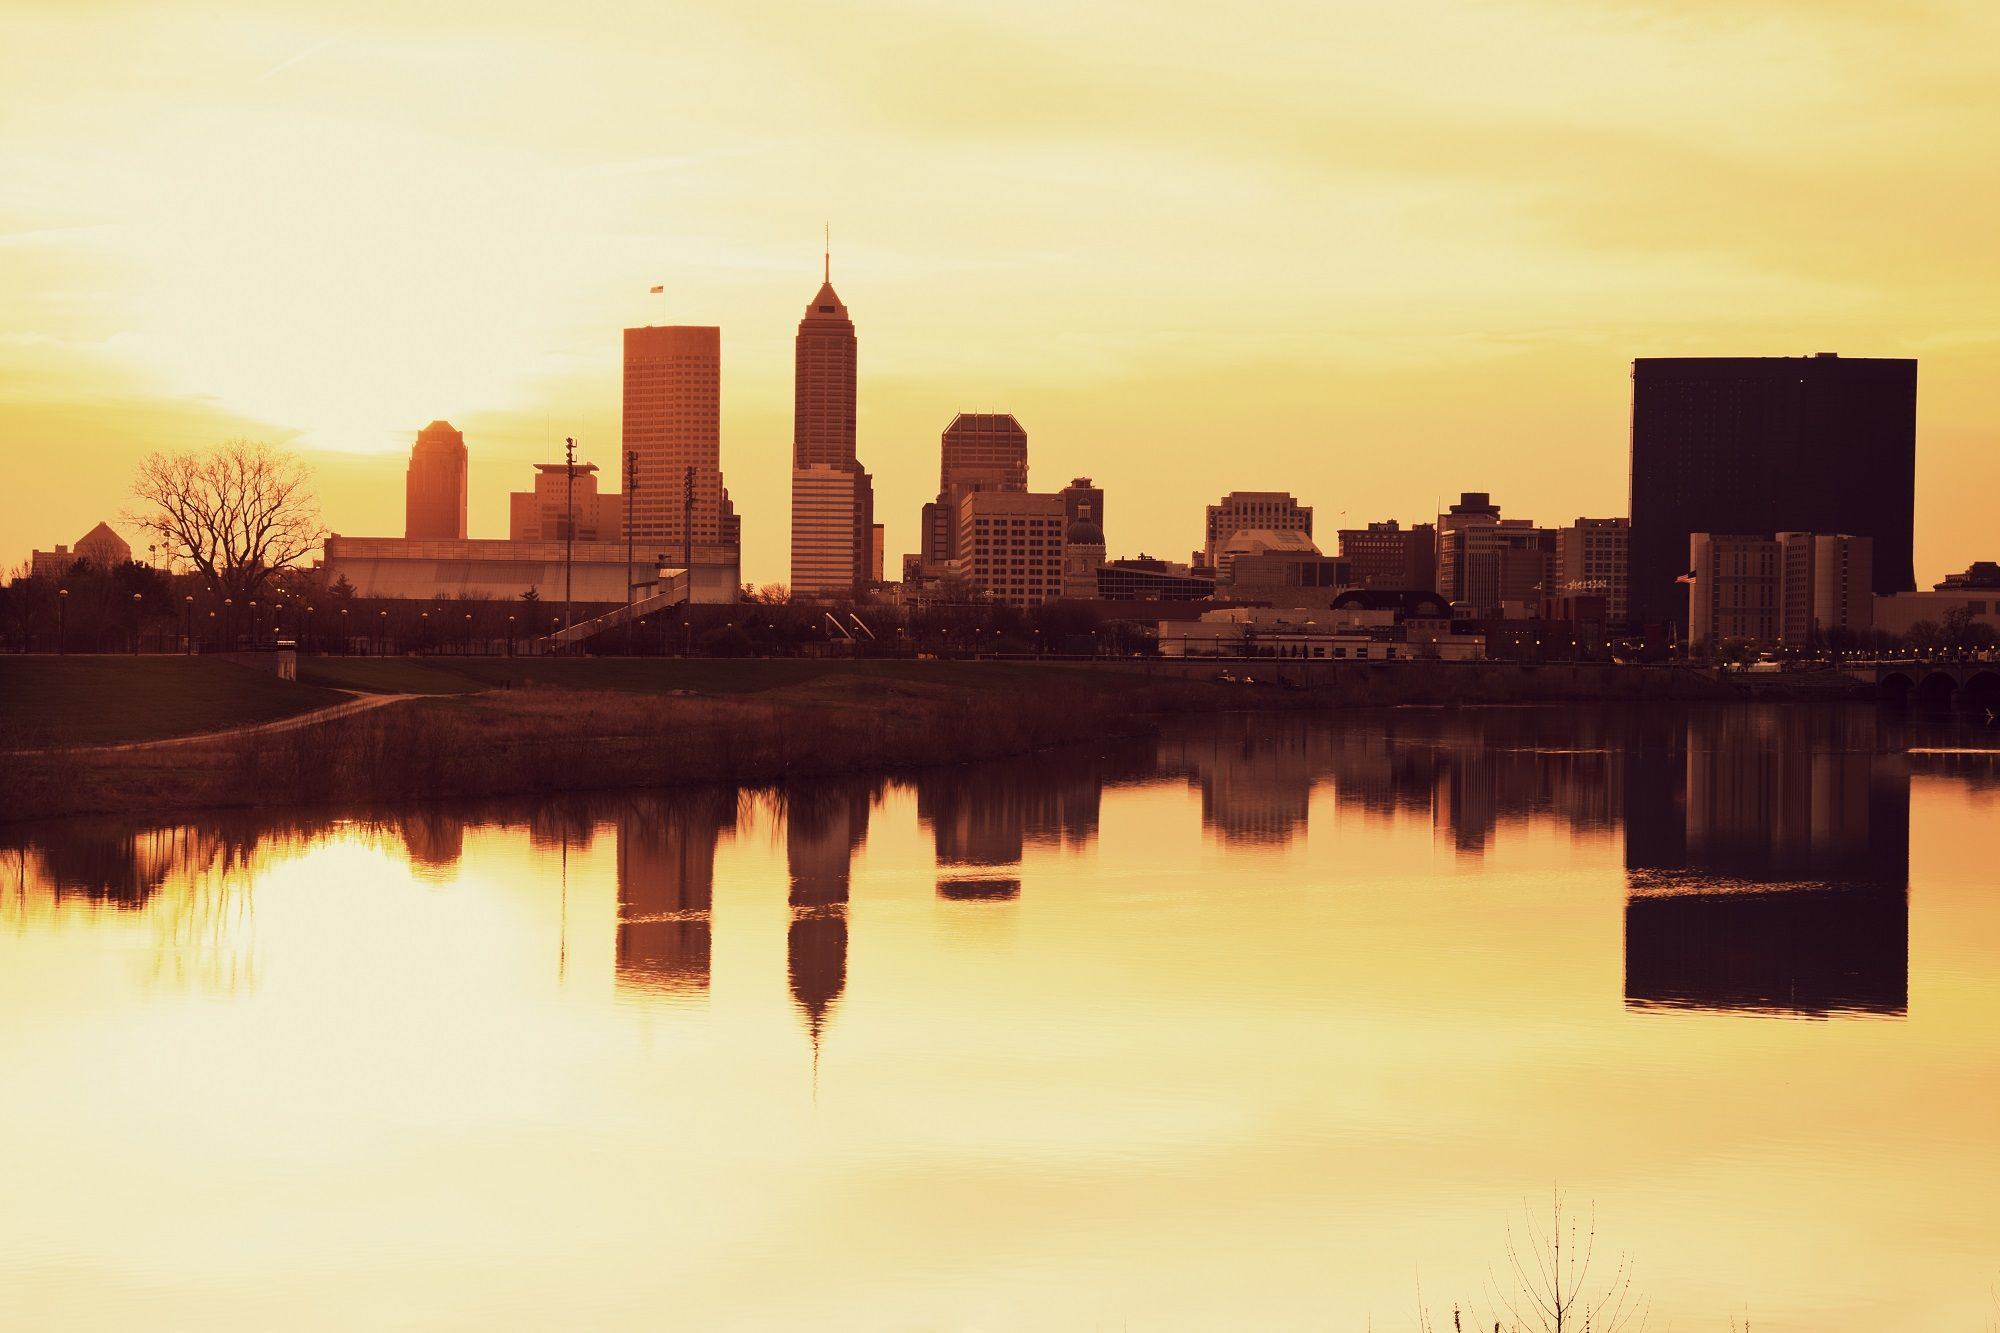 10. Indianapolis